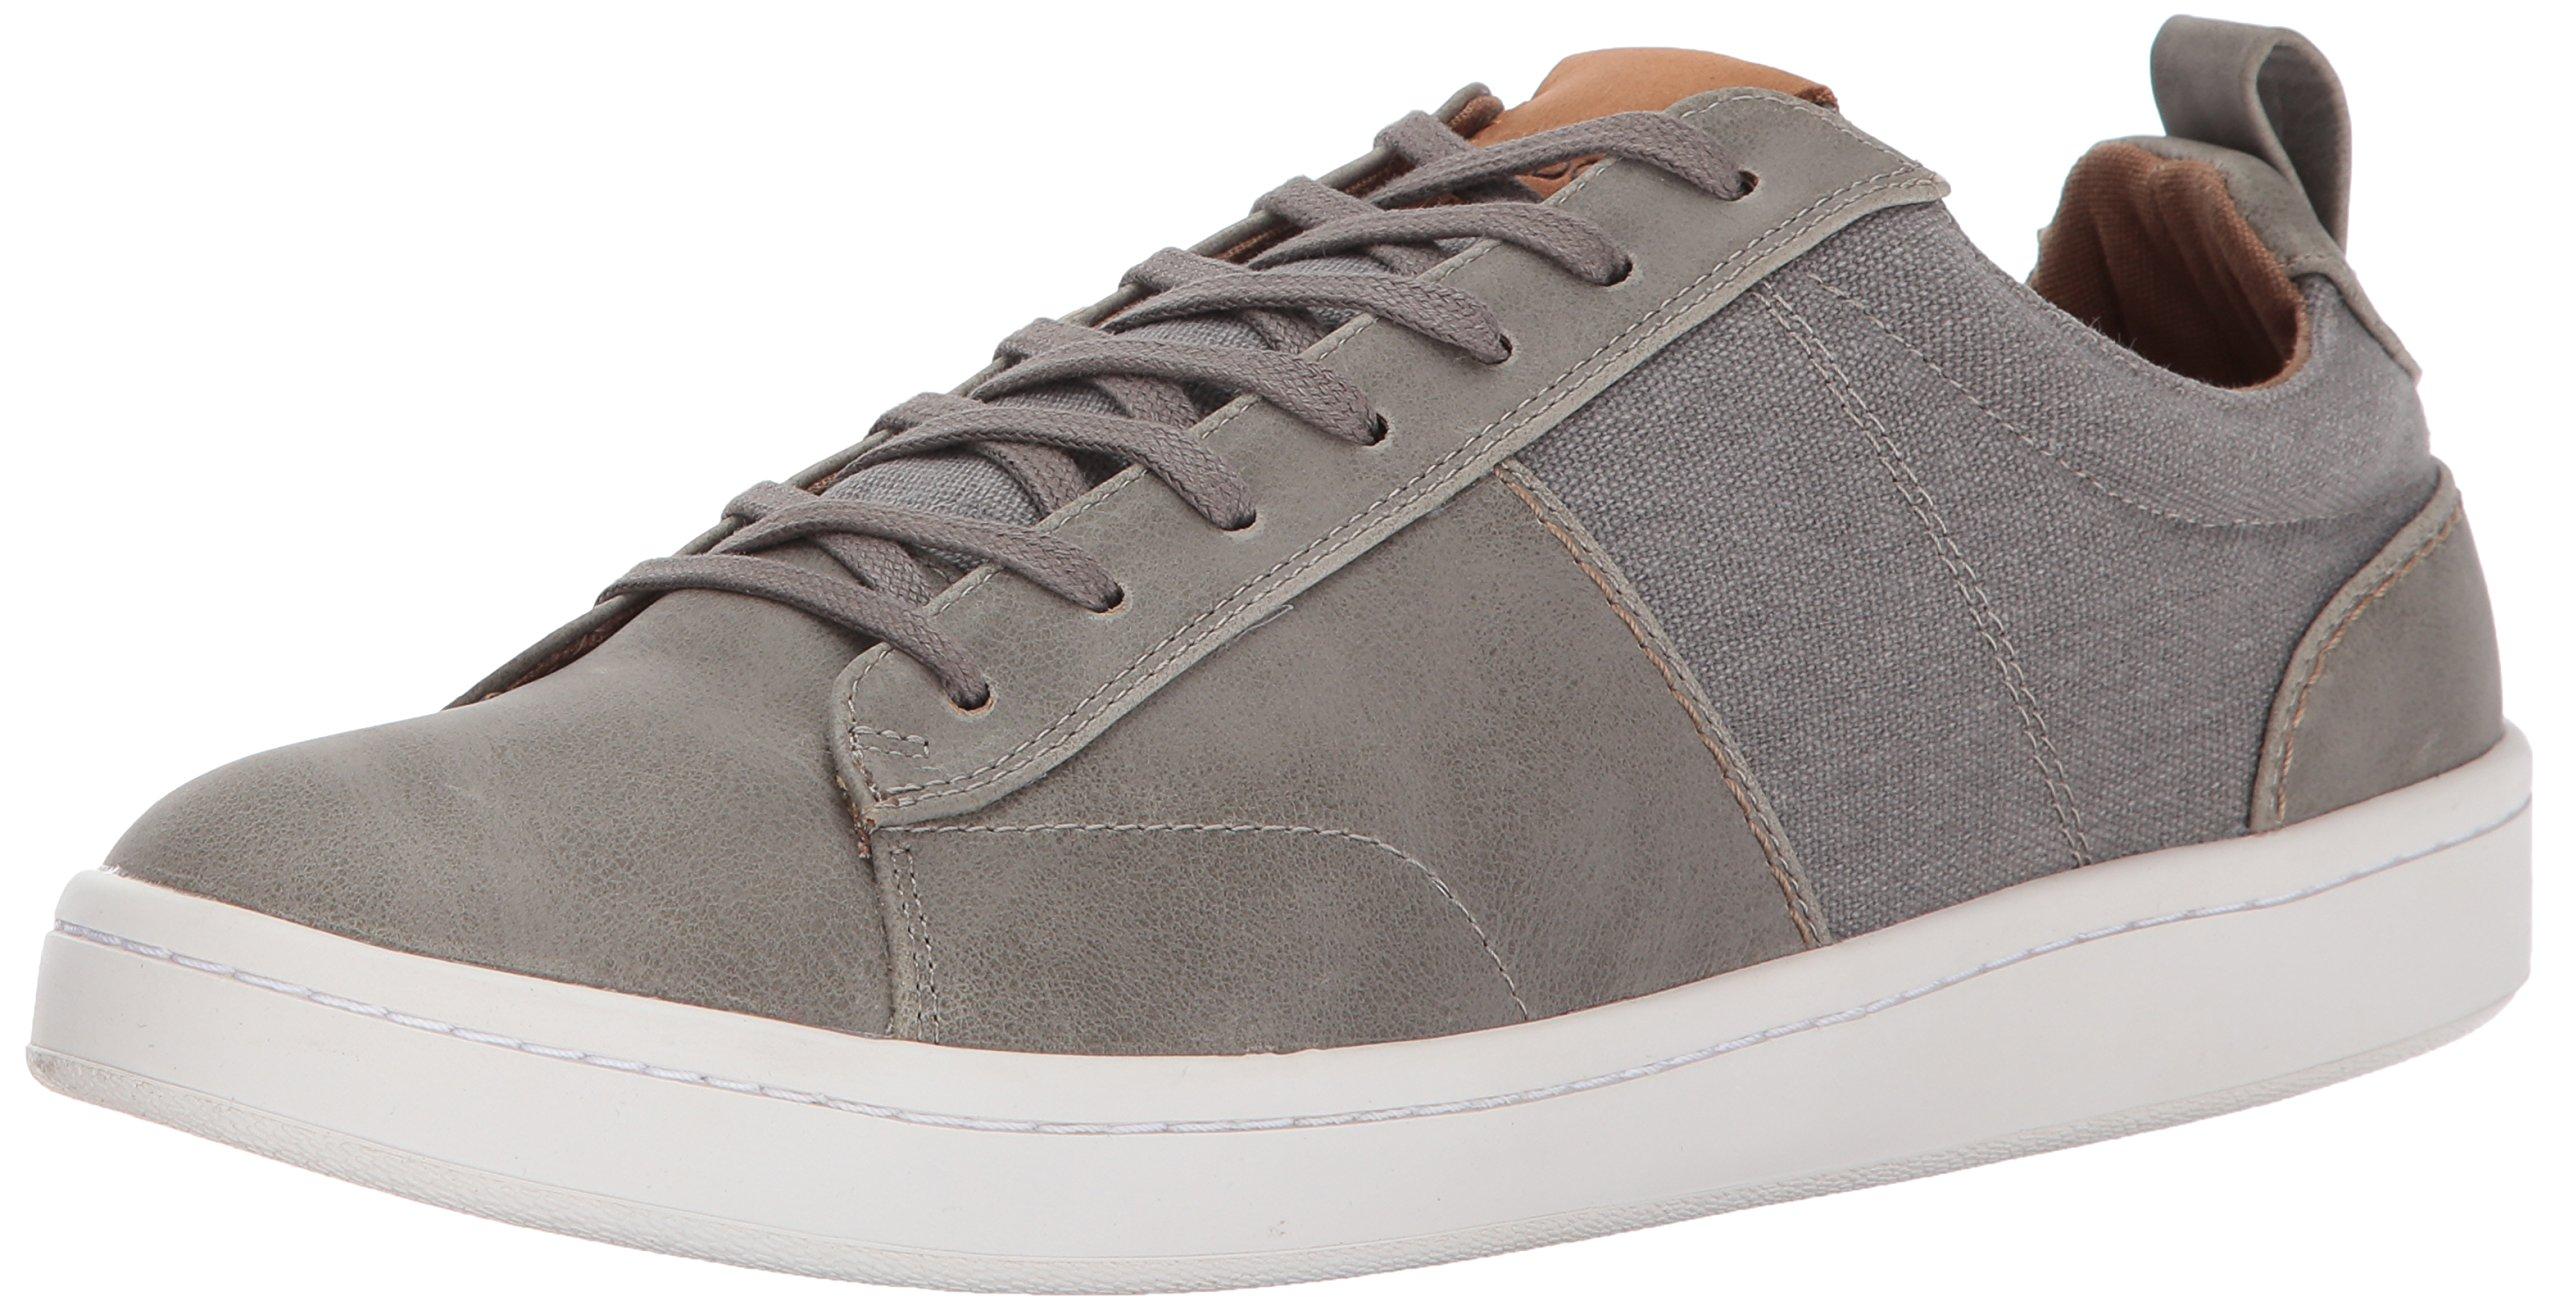 ALDO Men's Giffoni Fashion Sneaker, Dark Grey, 9.5 D US